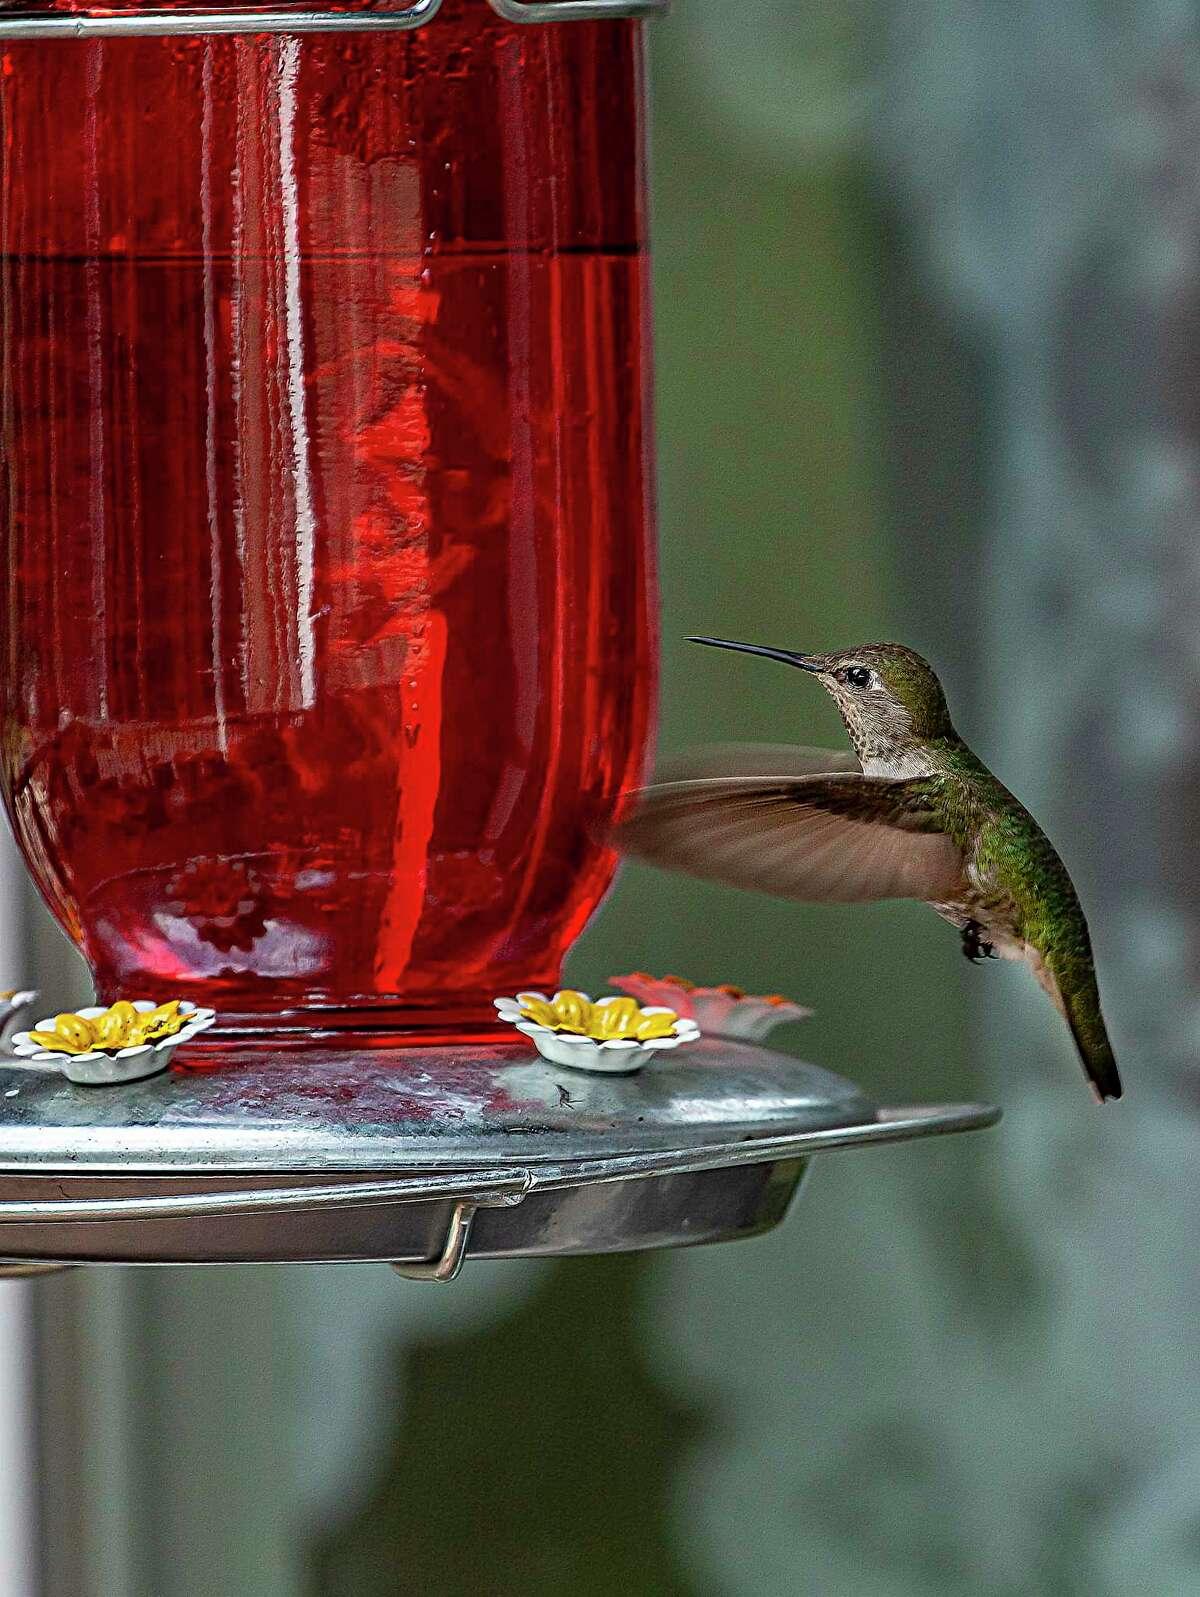 Hang a hummingbird feeder to take advantage of the fall hummingbird migration.